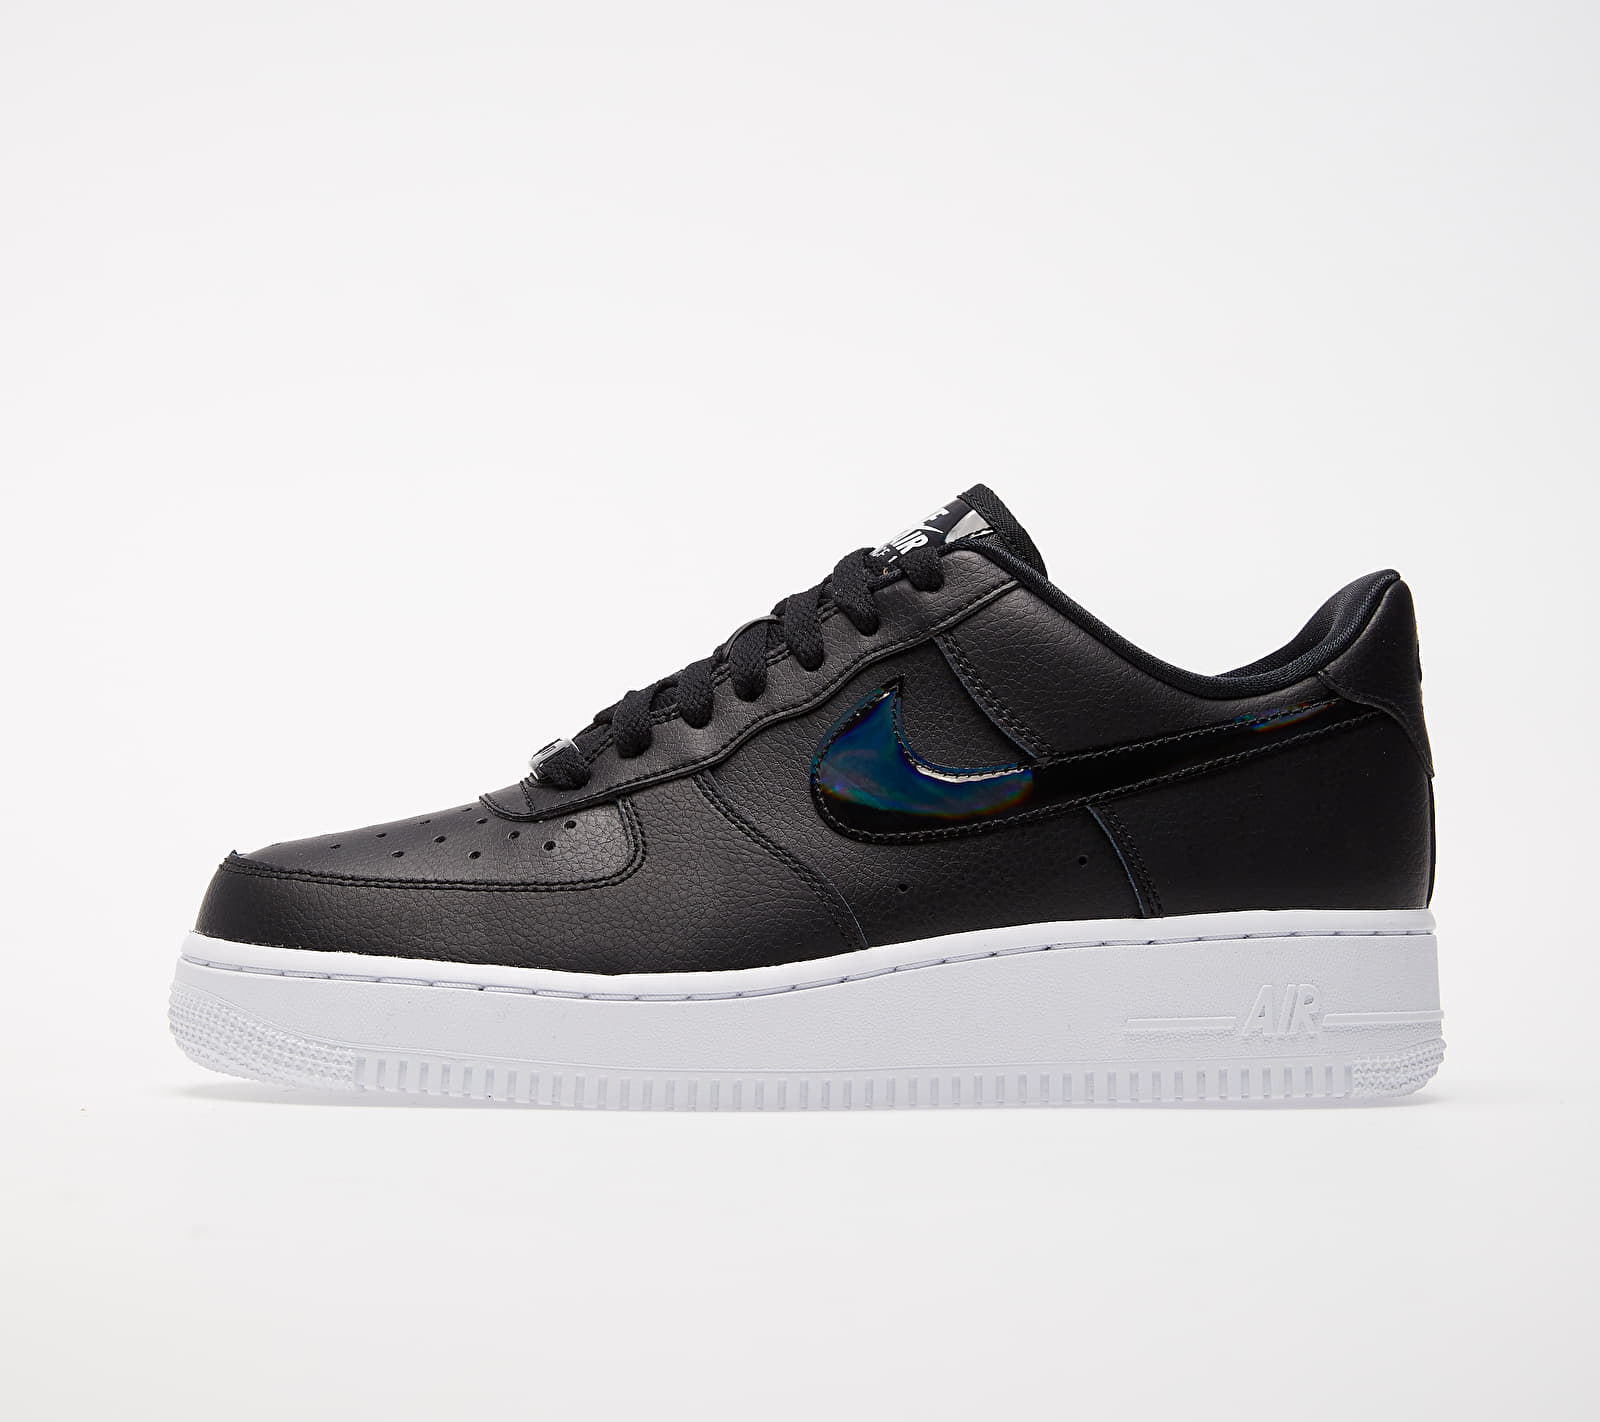 Nike Wmns Air Force 1 '07 Essential Black/ Black-White EUR 37.5